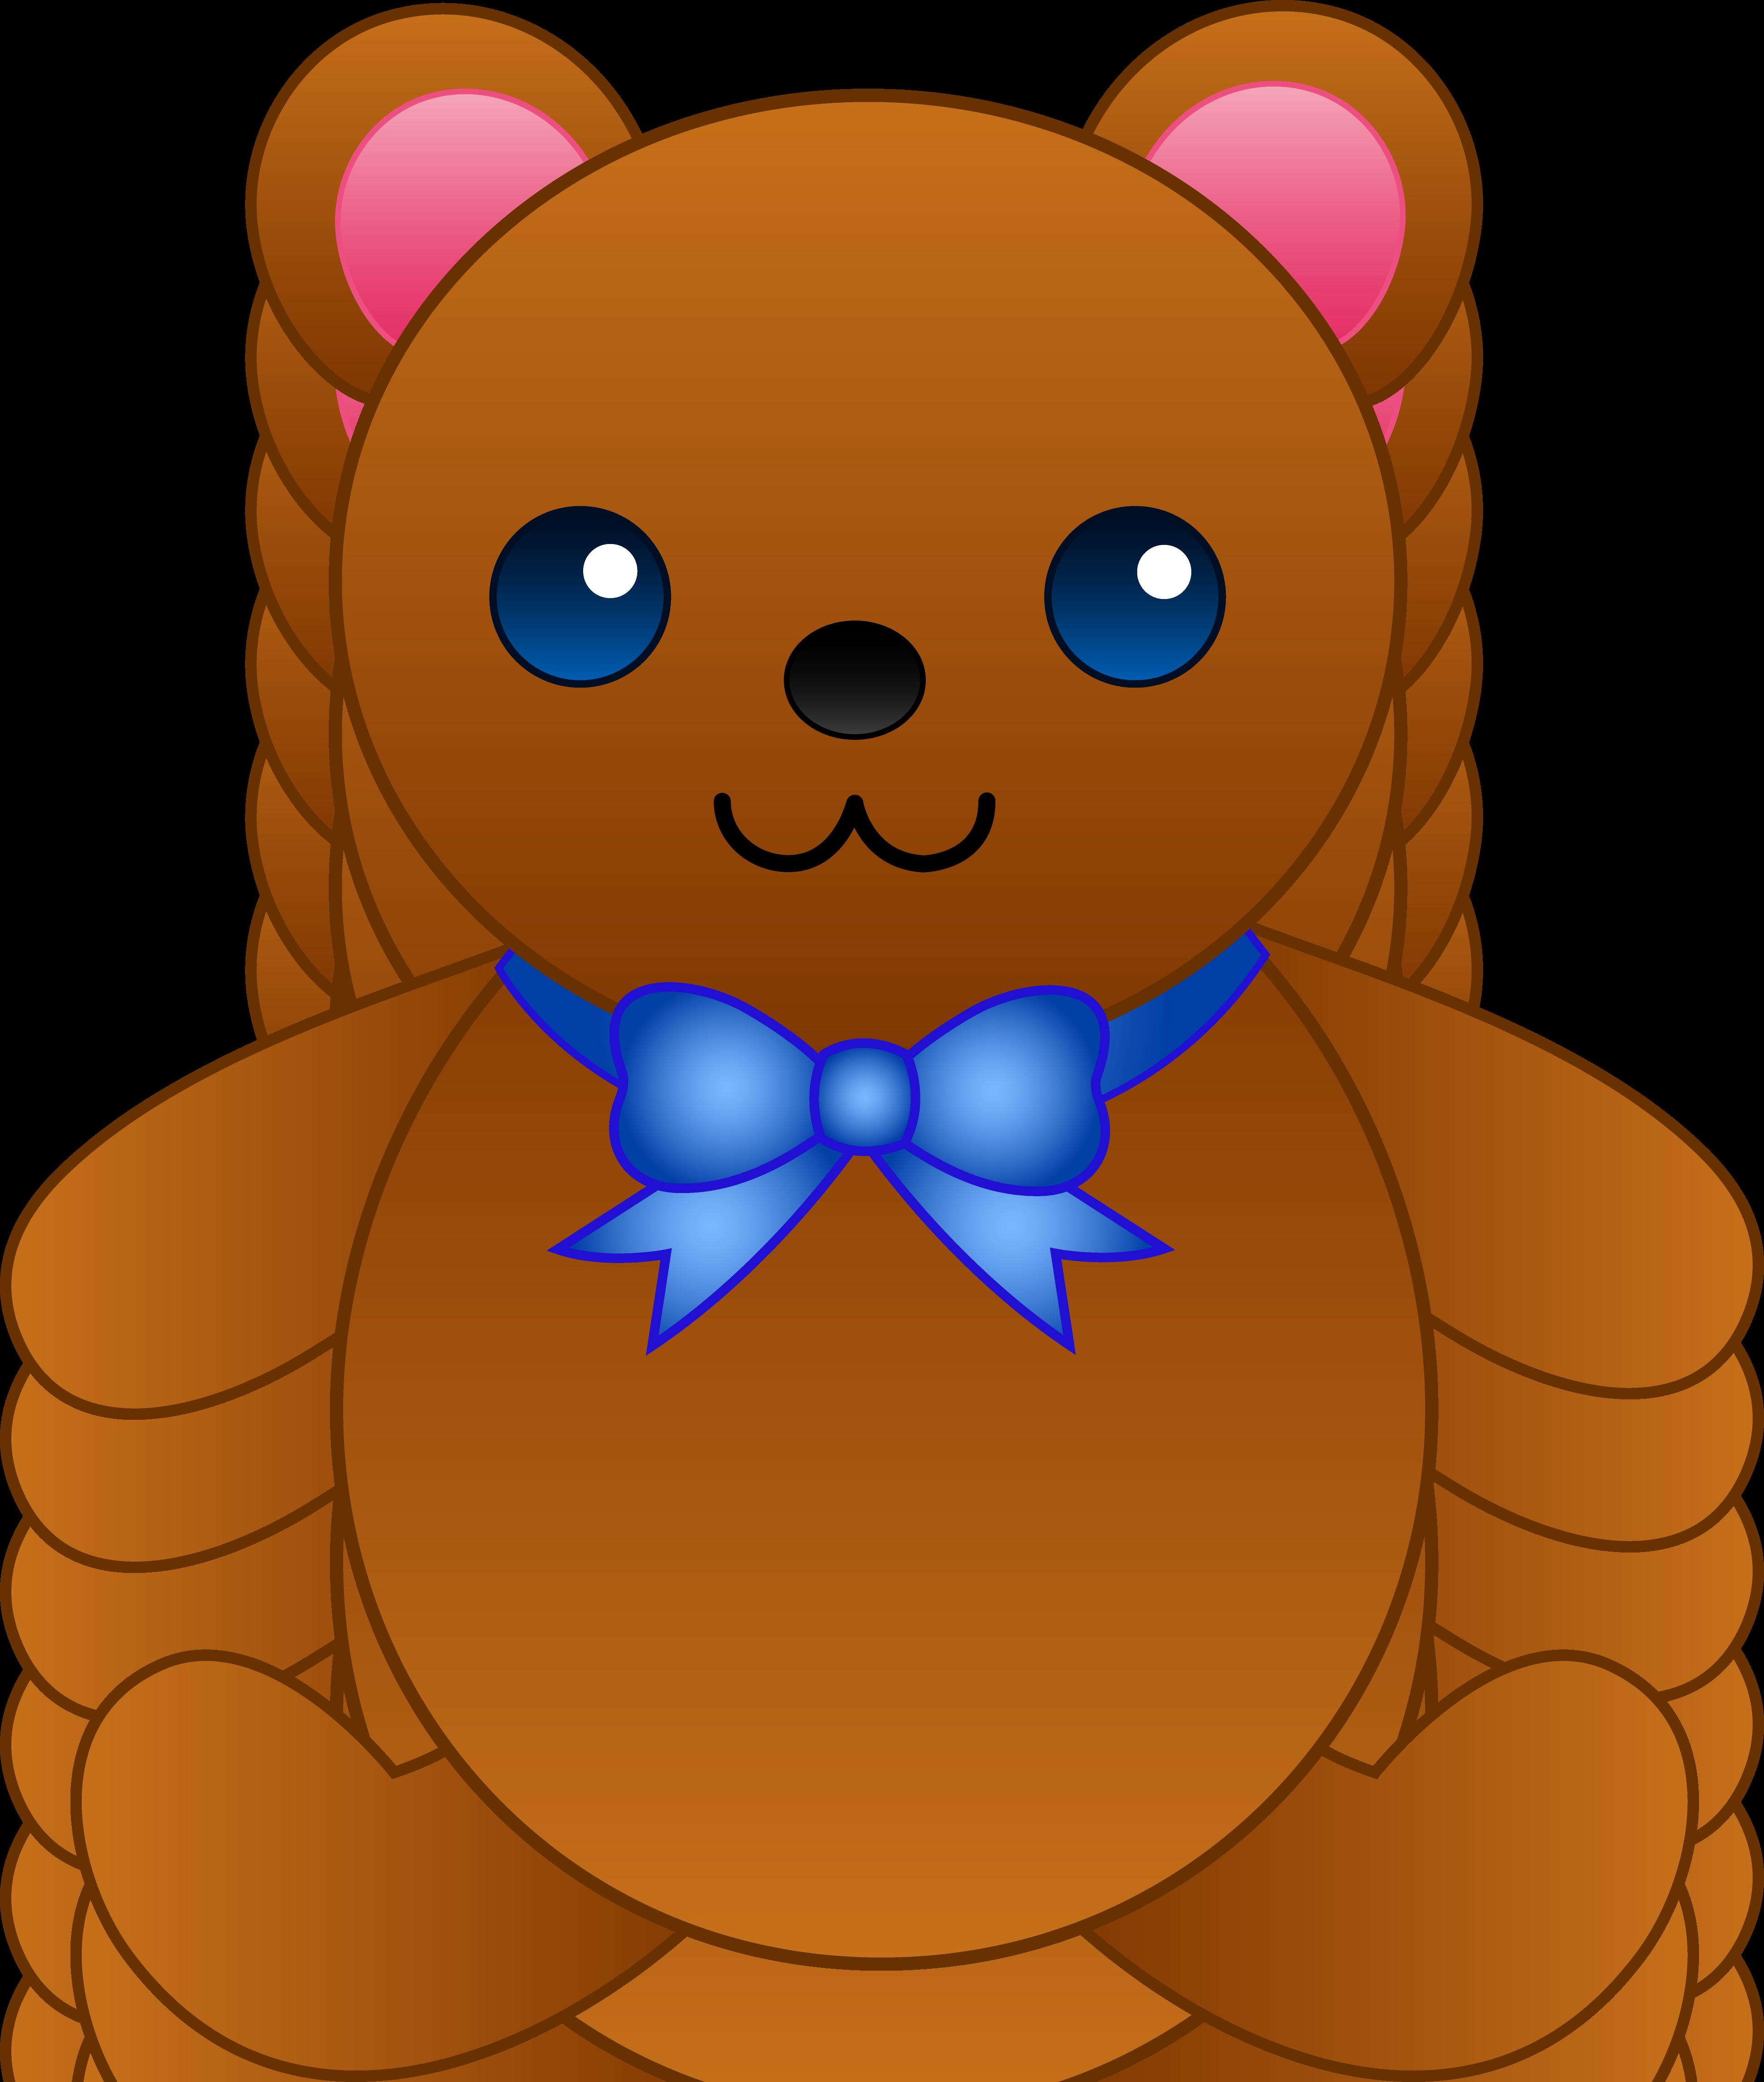 3881x4581 Cute Bear Free Teddy Bear Clip Art Pictures 4